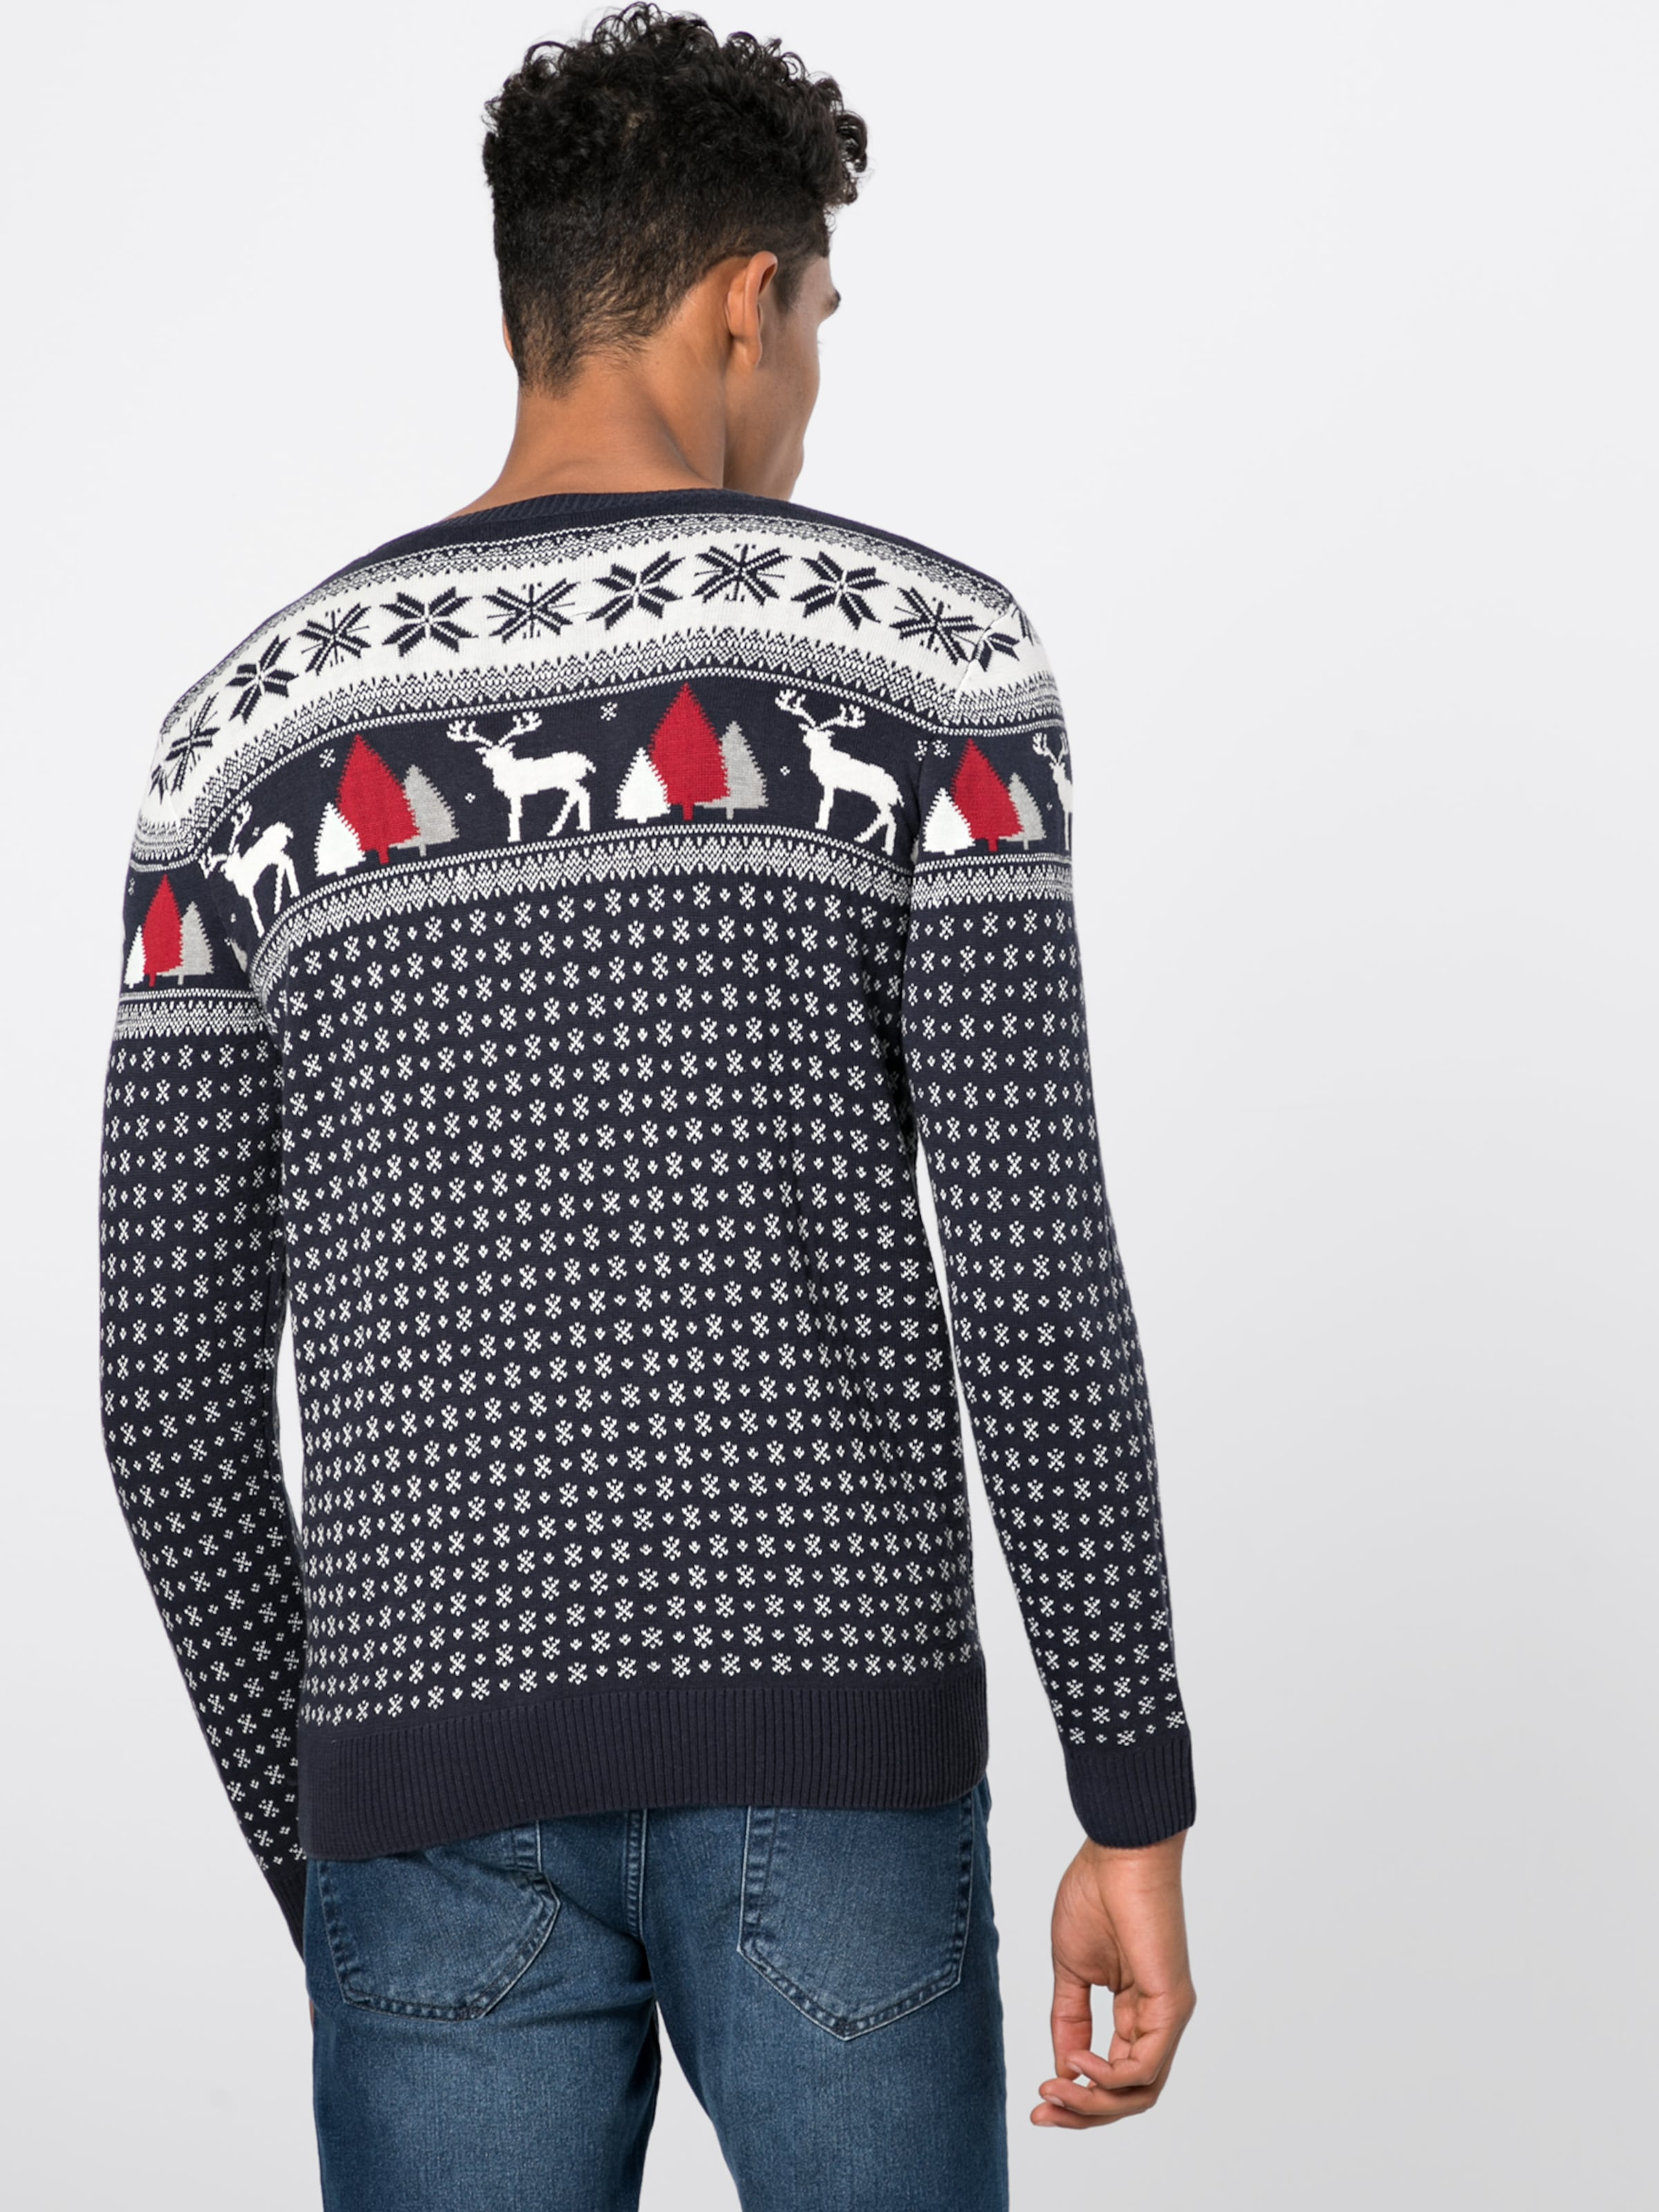 Pull En Bleu NuitBlanc 'christmas Tom over Sweater' Tailor pSqzUVGM